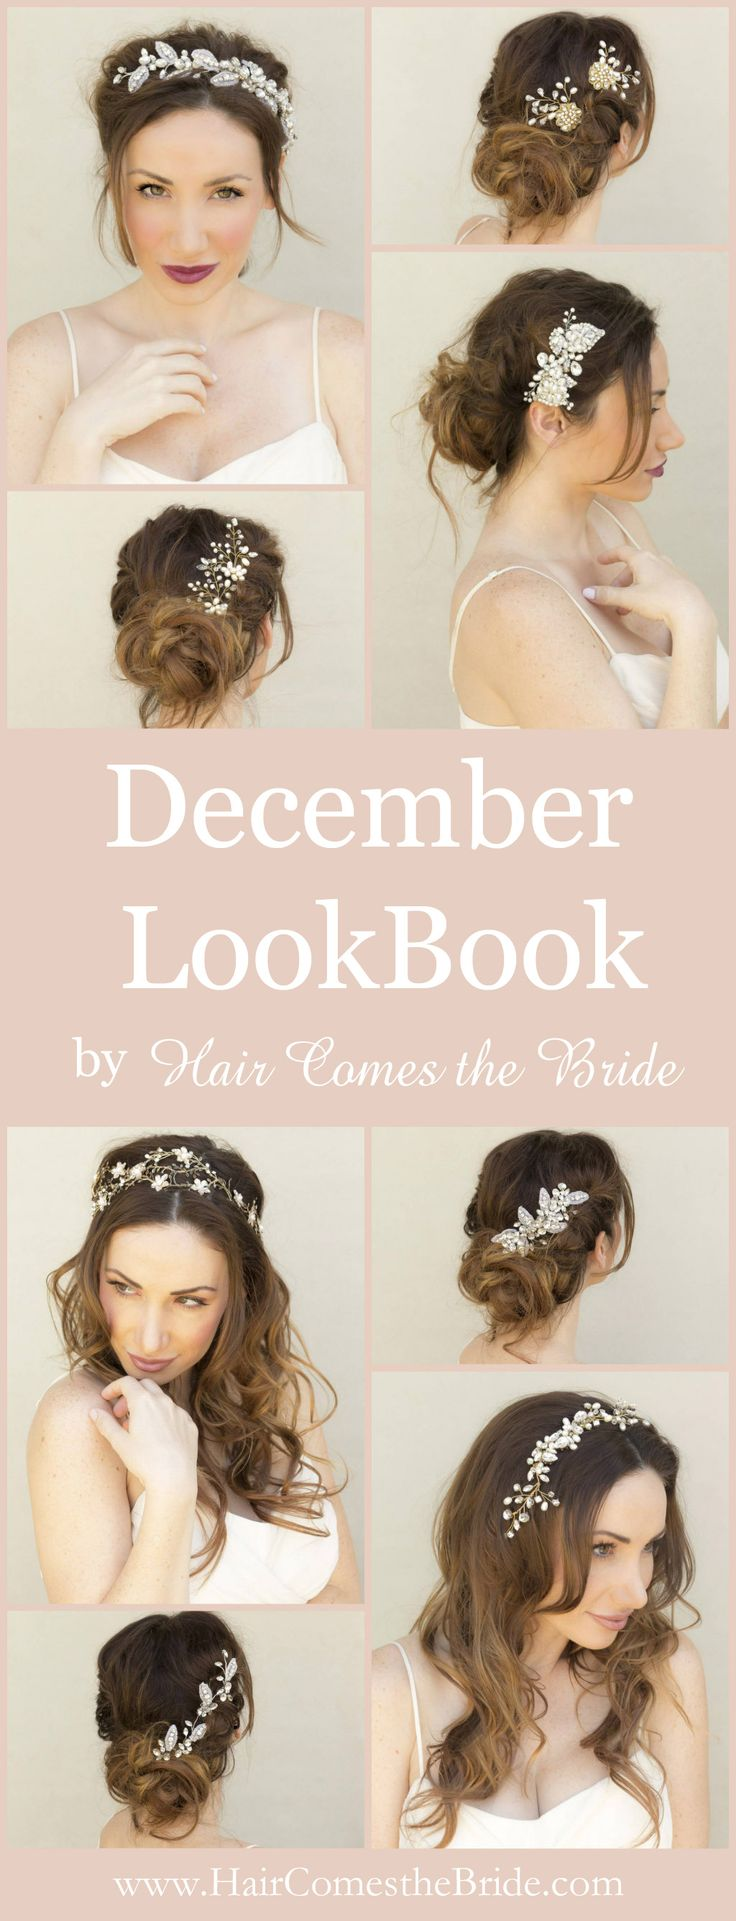 76 best bridal beauty blog images on pinterest | bridal beauty